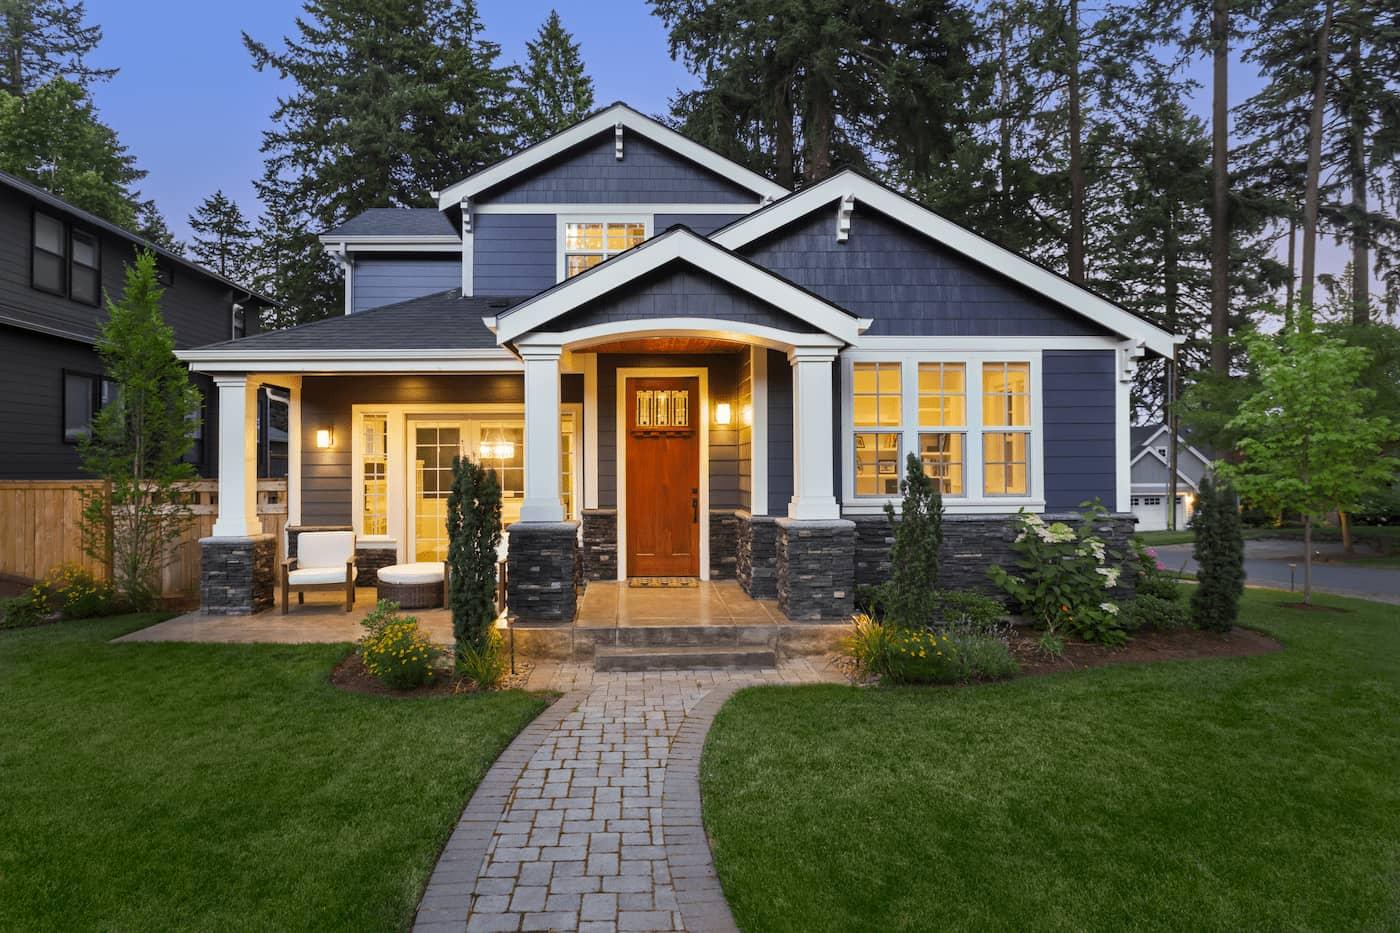 Professional landscape for maximum NOI rental property